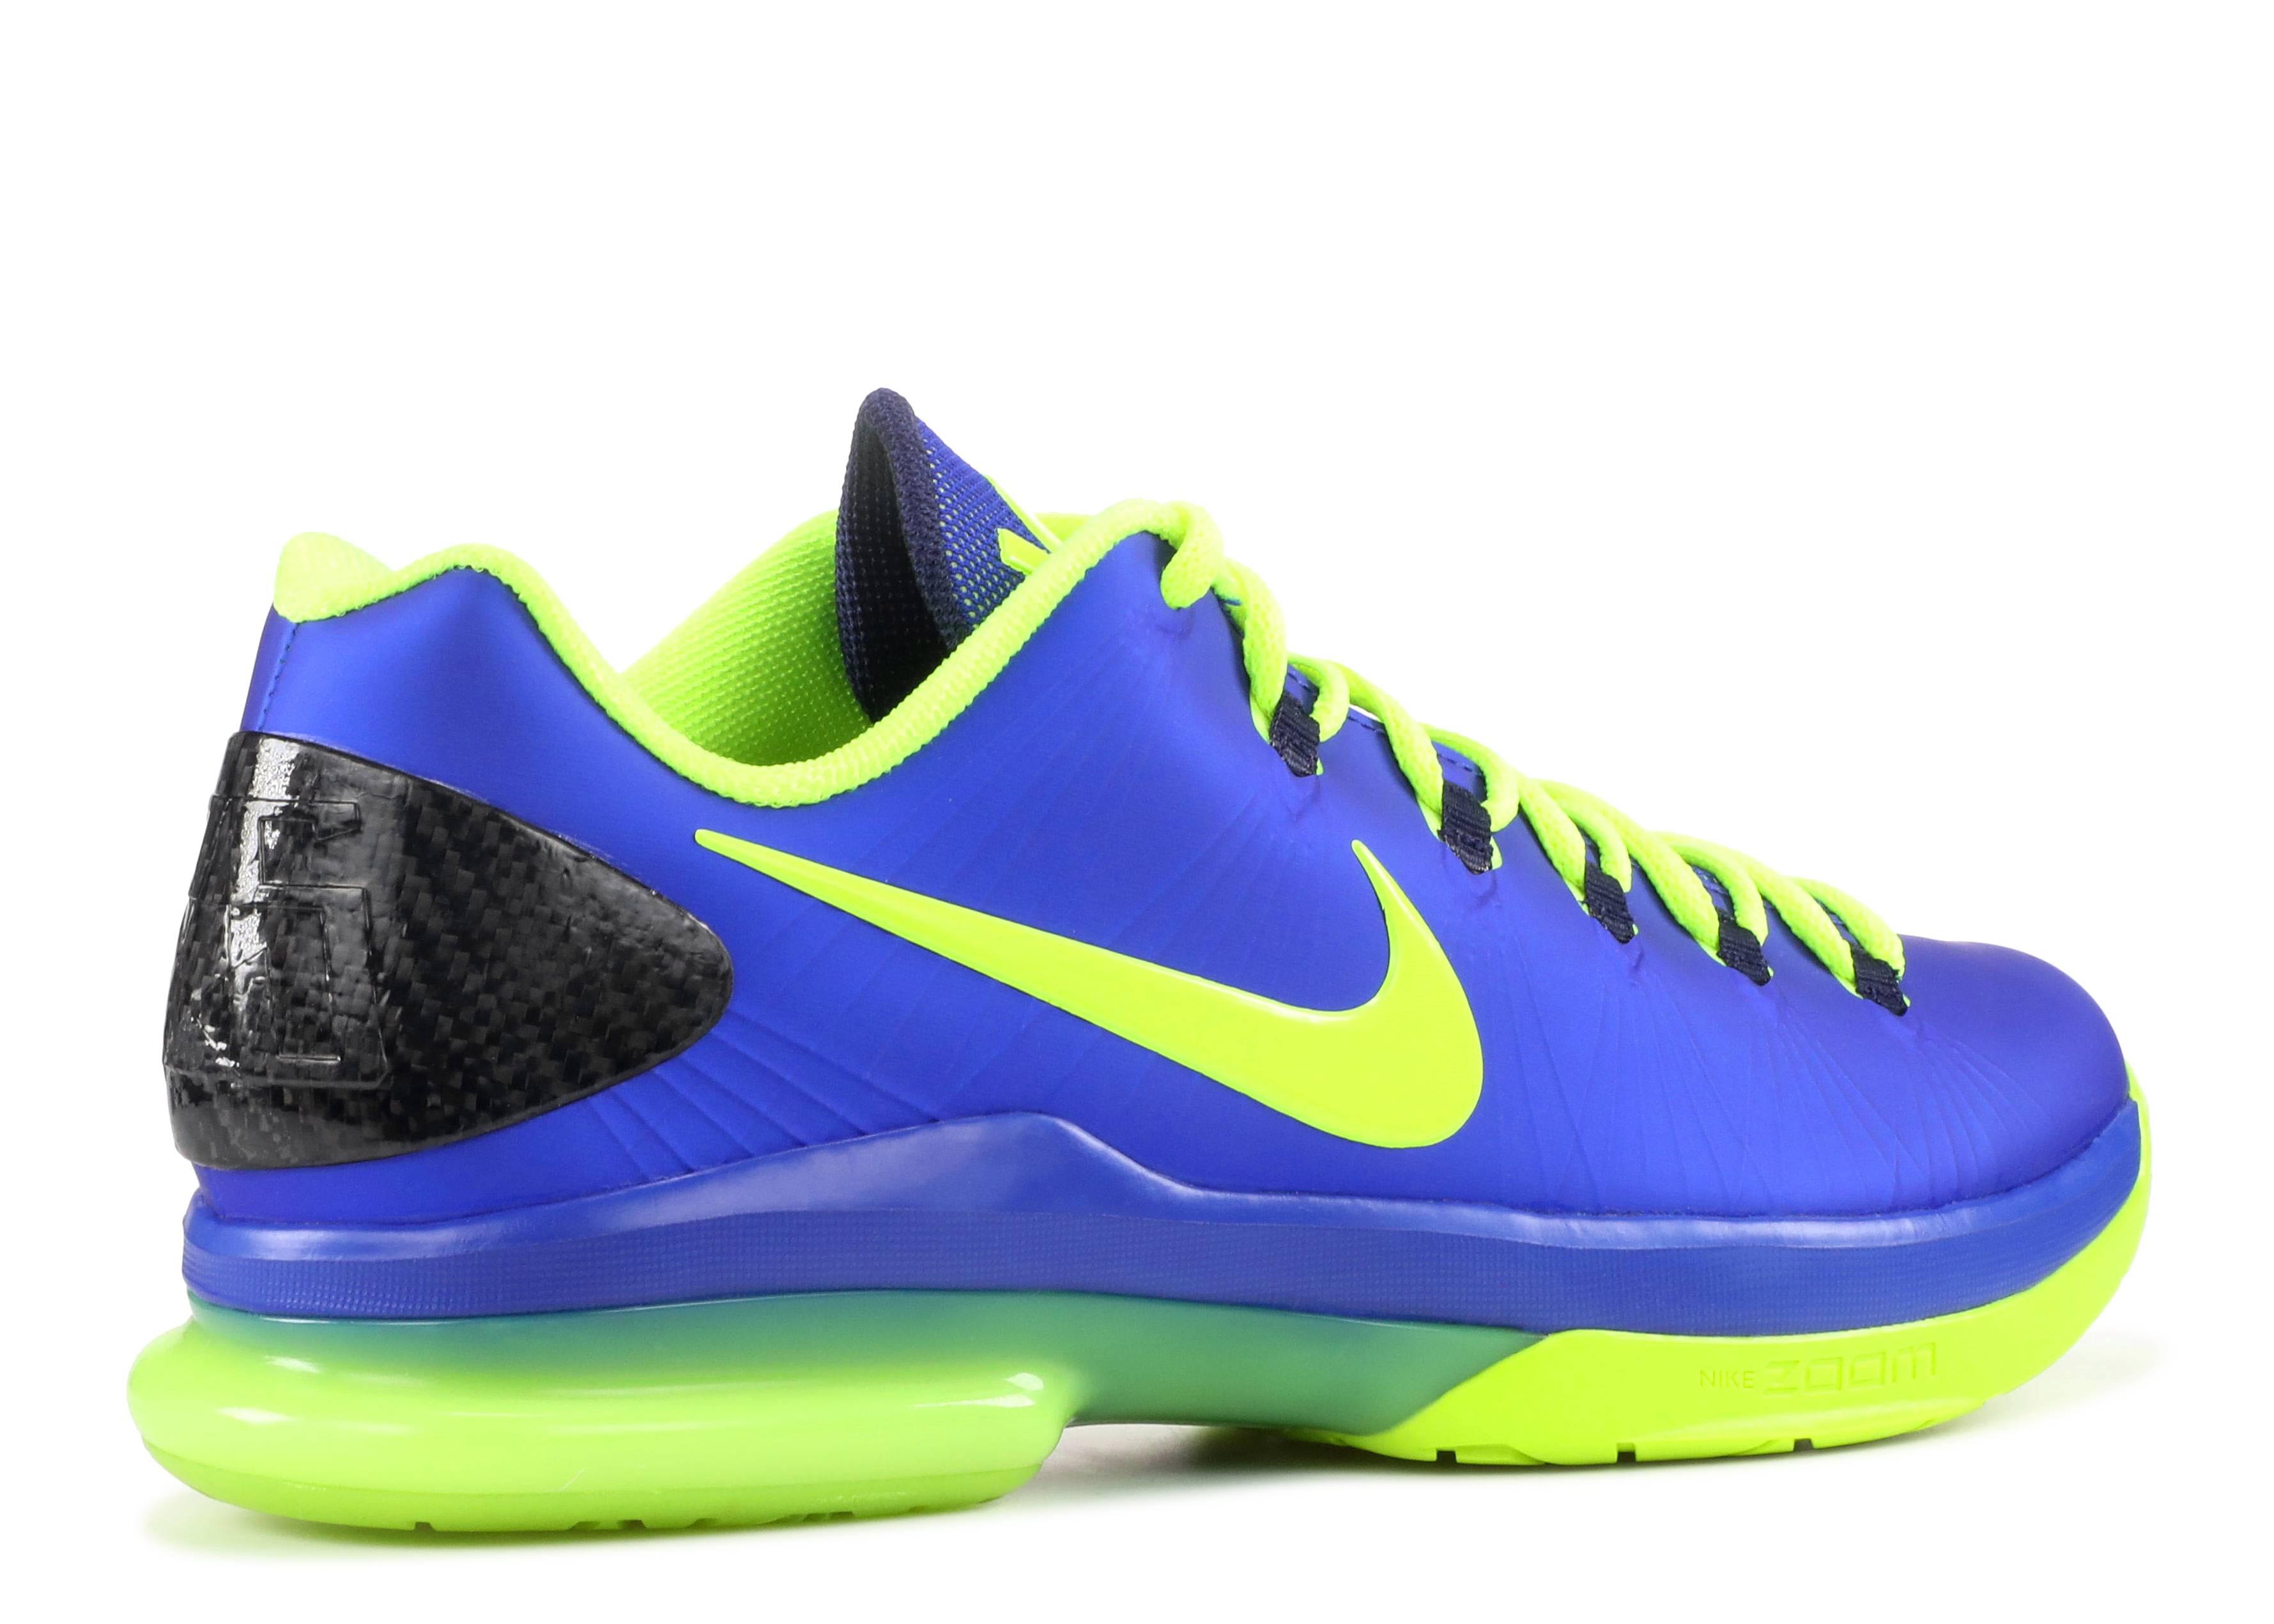 "Kd 5 Elite ""superhero"" - Nike - 585386 400 - hyper blue ..."